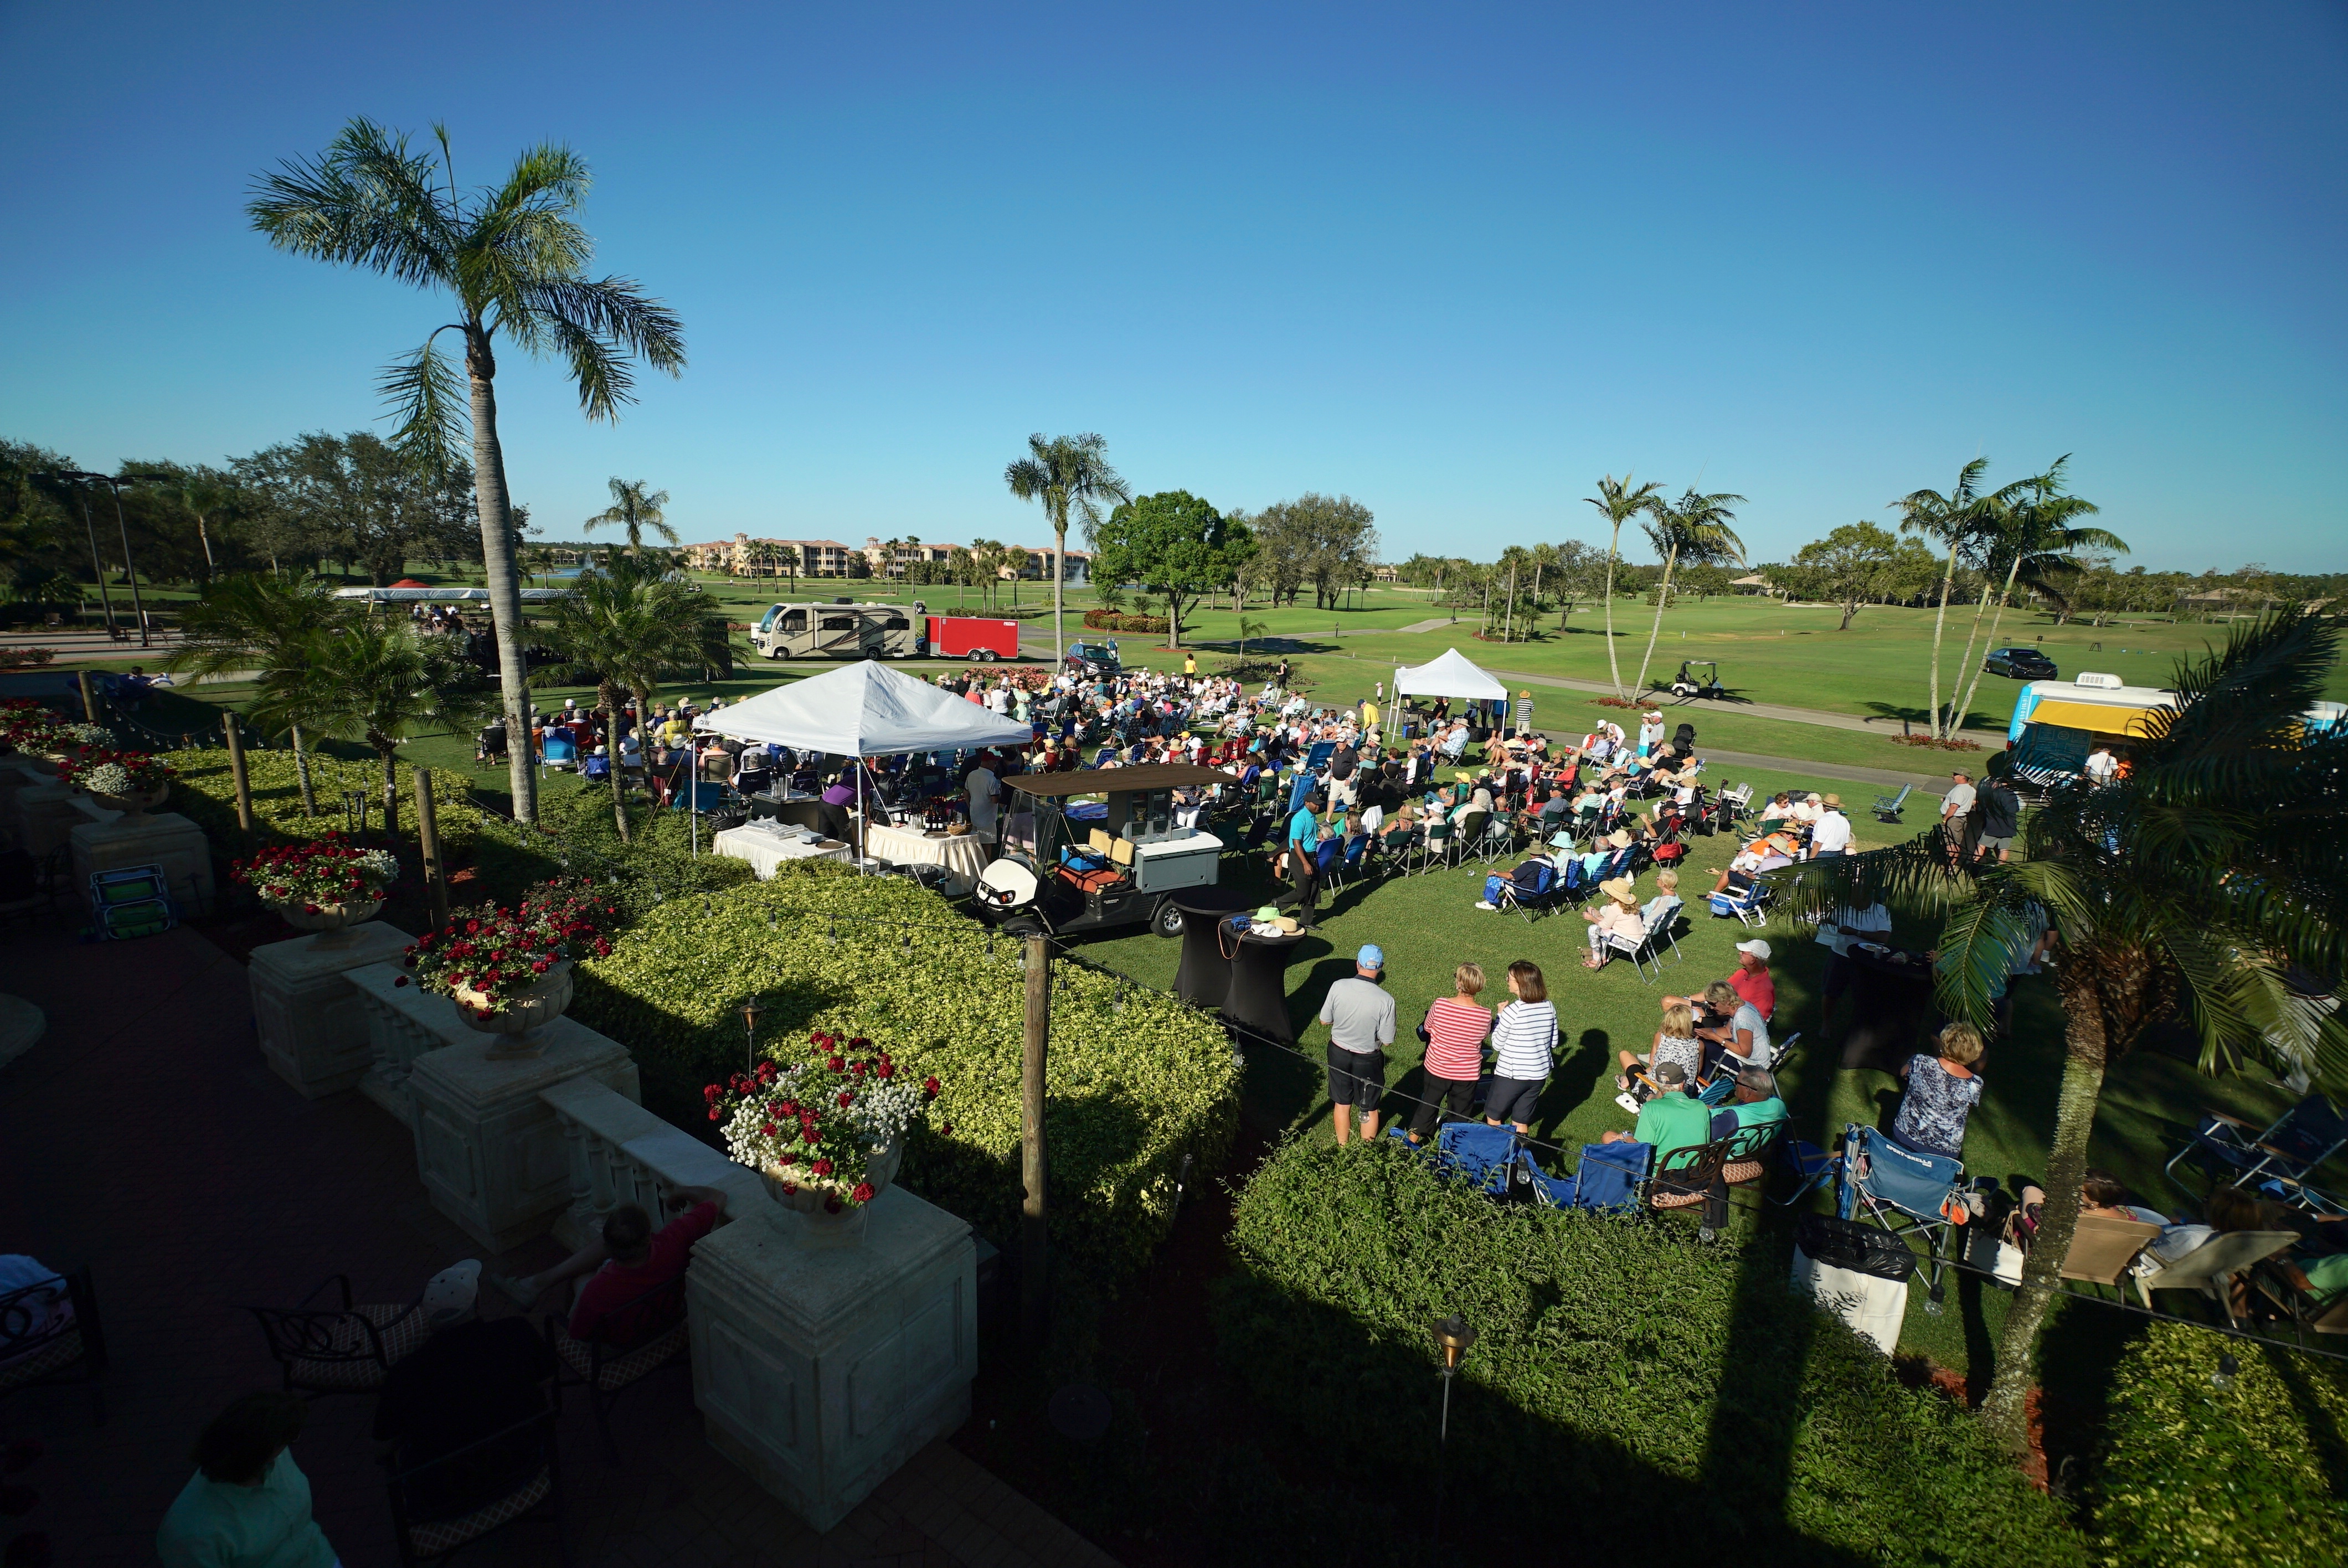 Vineyards Country Club Activities | Vineyards Country Club Pertaining To Naples Florida Activities Calendar